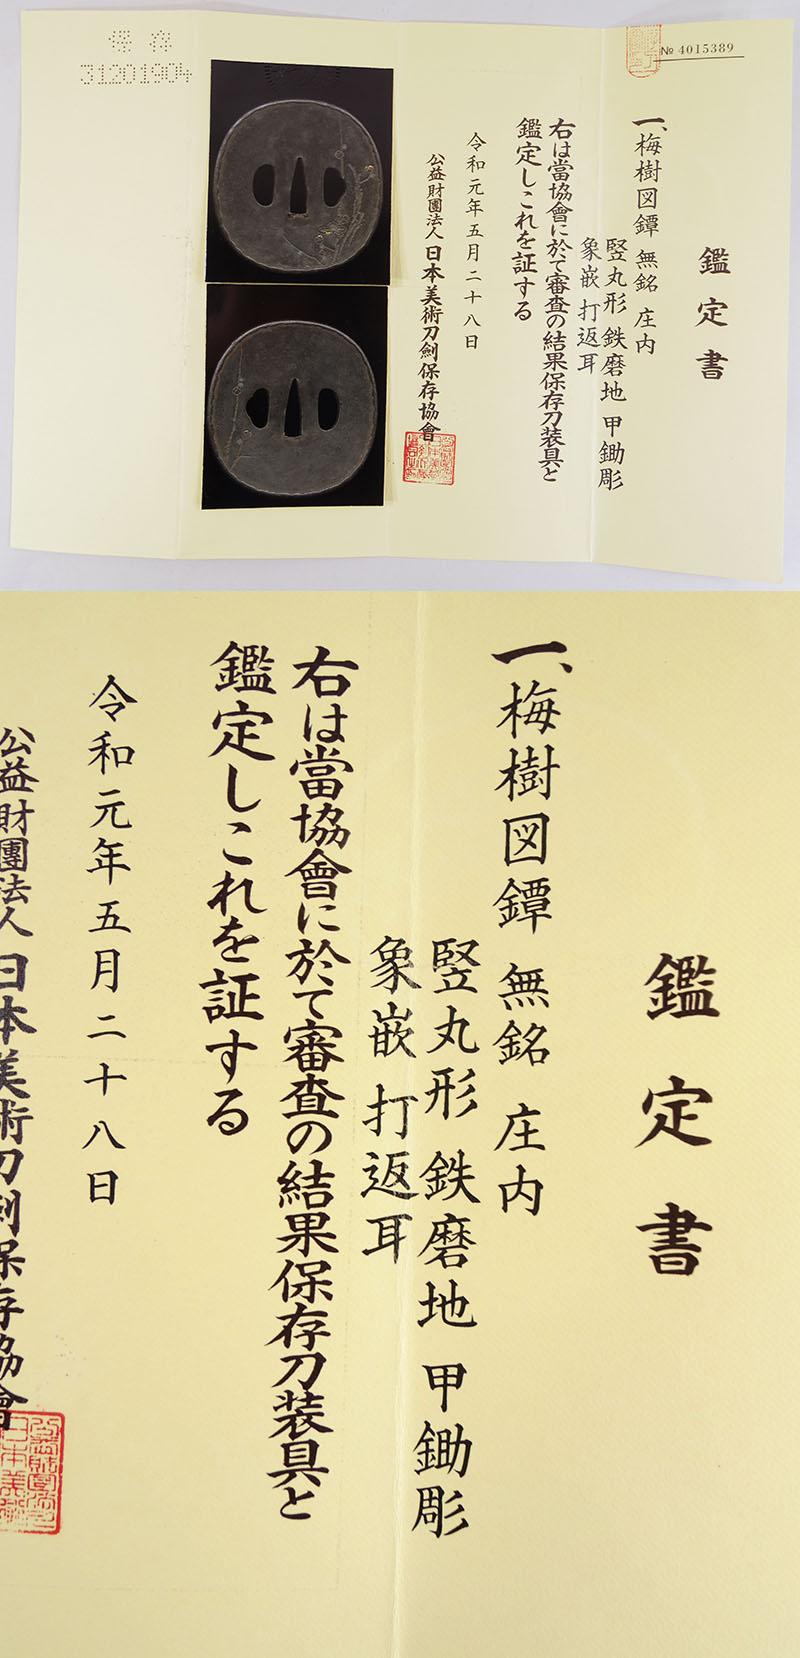 梅樹図鍔 無銘 庄内(船田派) Picture of Certificate